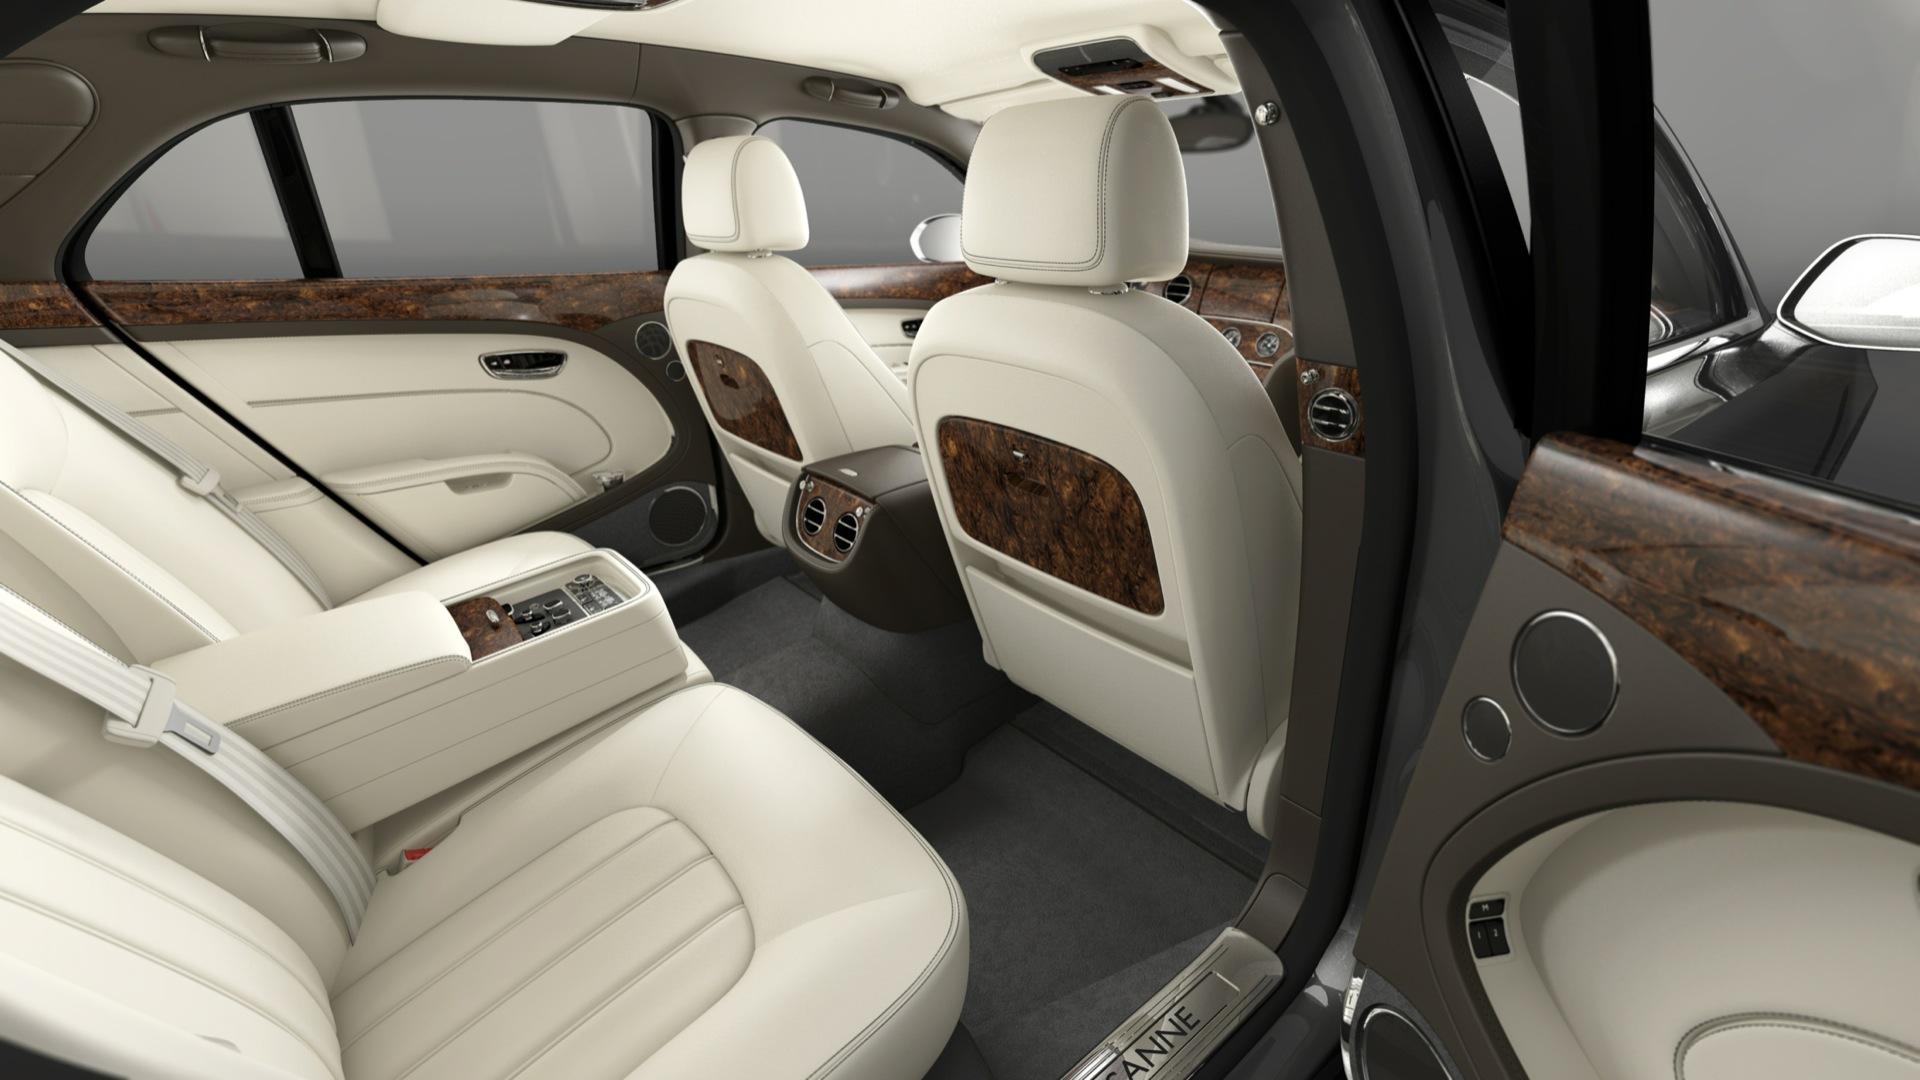 Bentley Mulsanne Interior Car s Overdrive